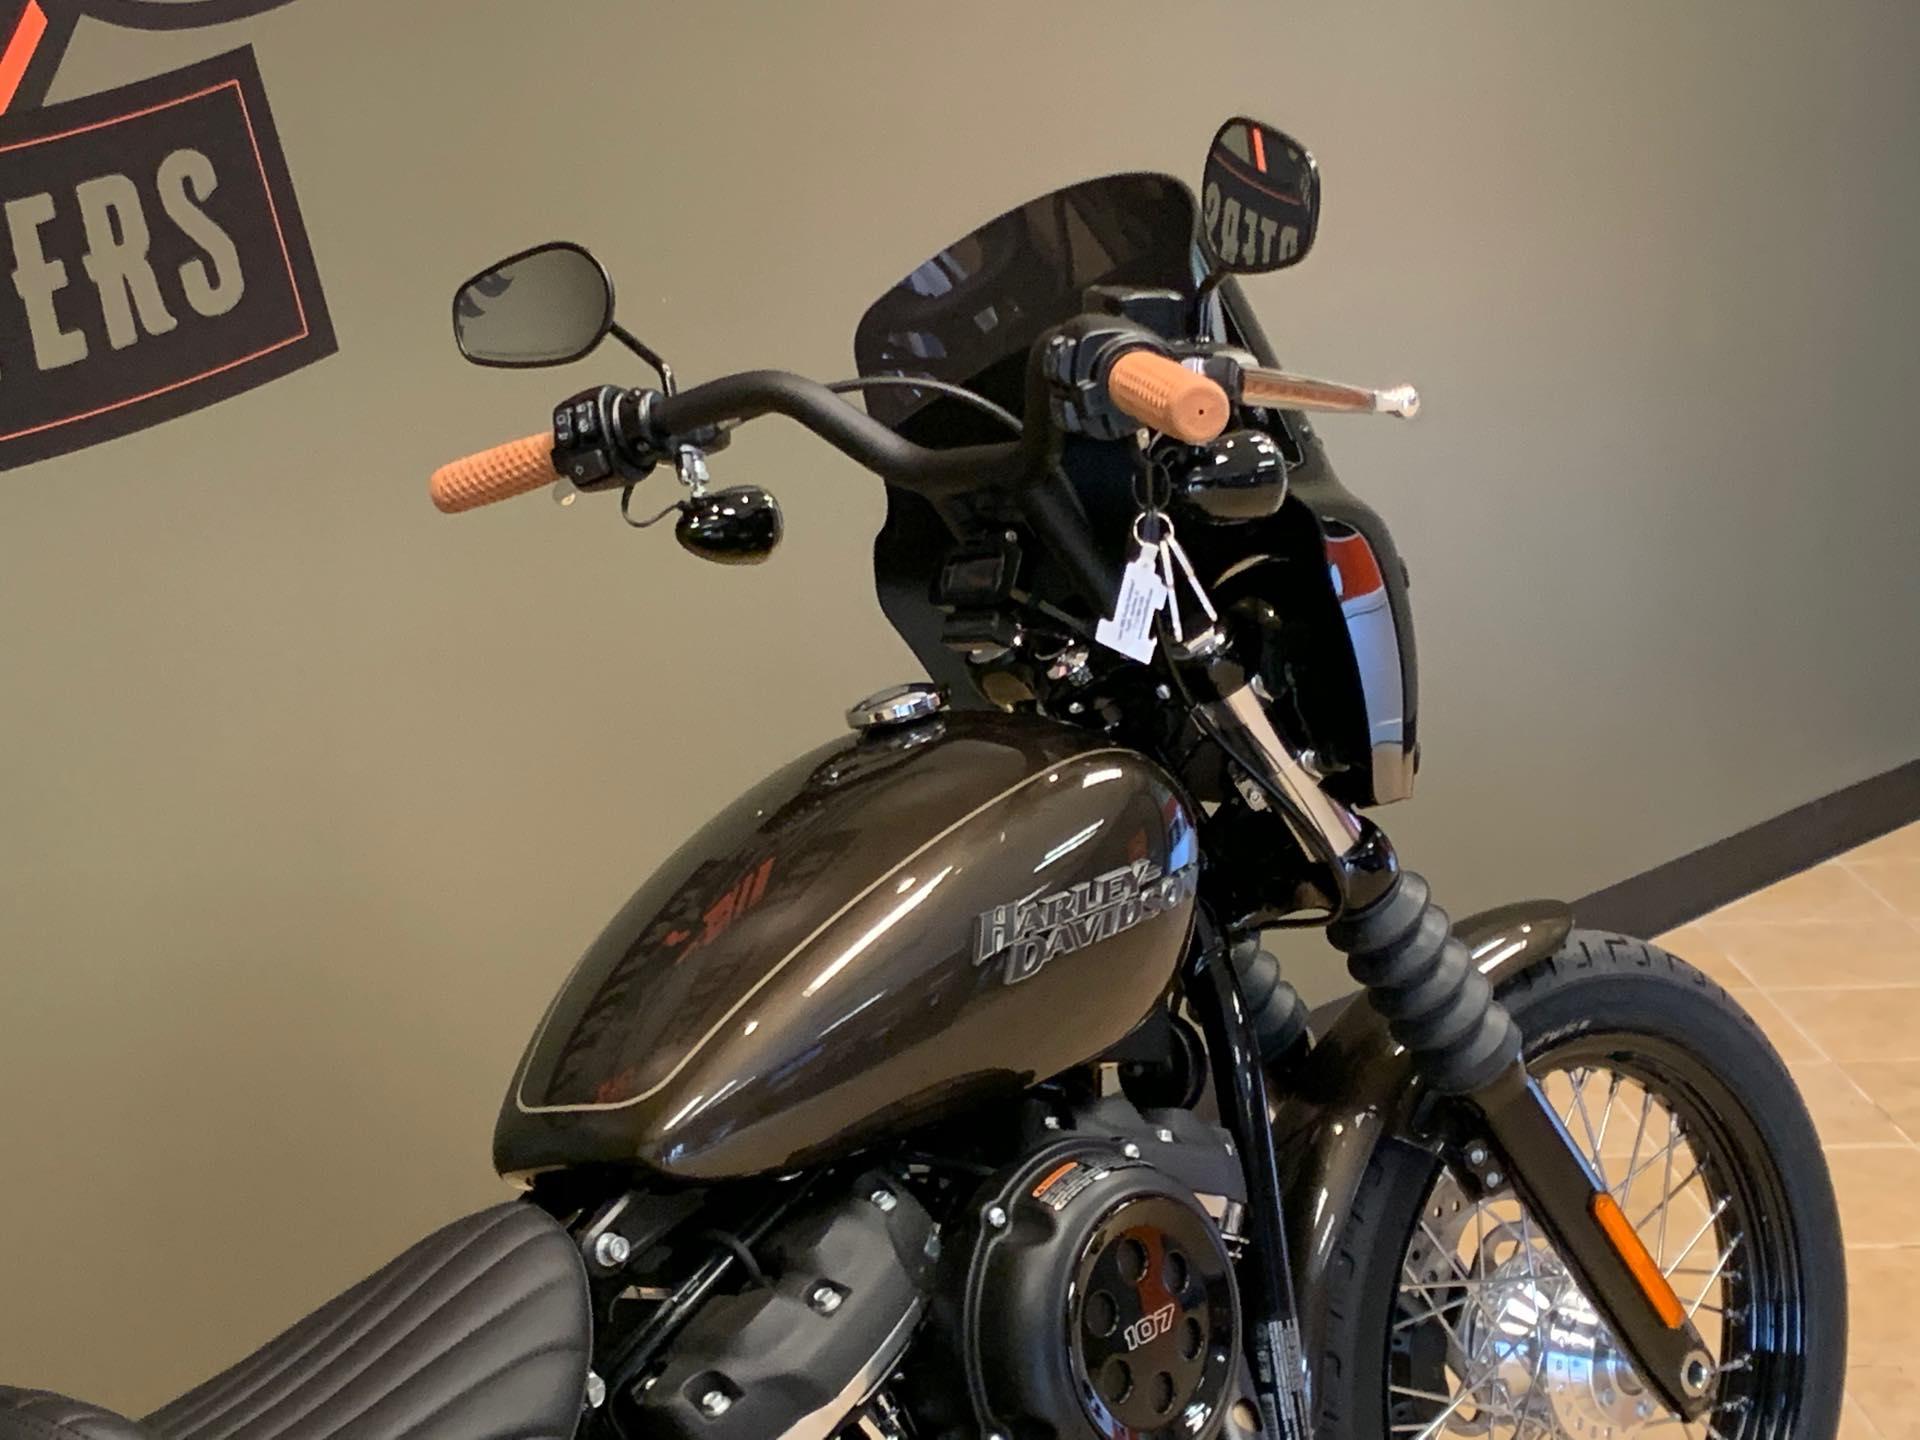 2020 Harley-Davidson Softail Street Bob at Loess Hills Harley-Davidson